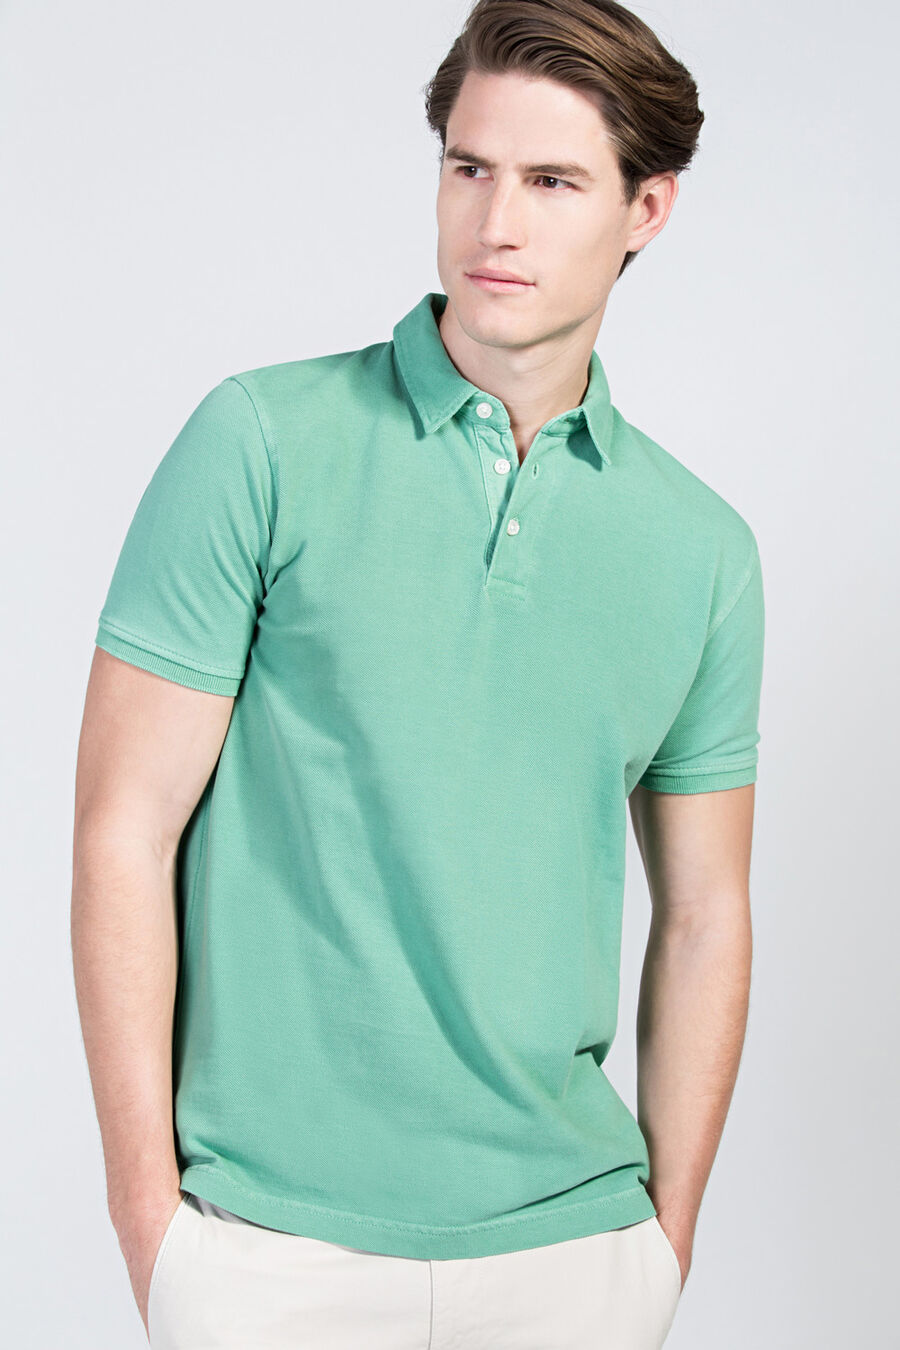 Garment-dyed polo shirt